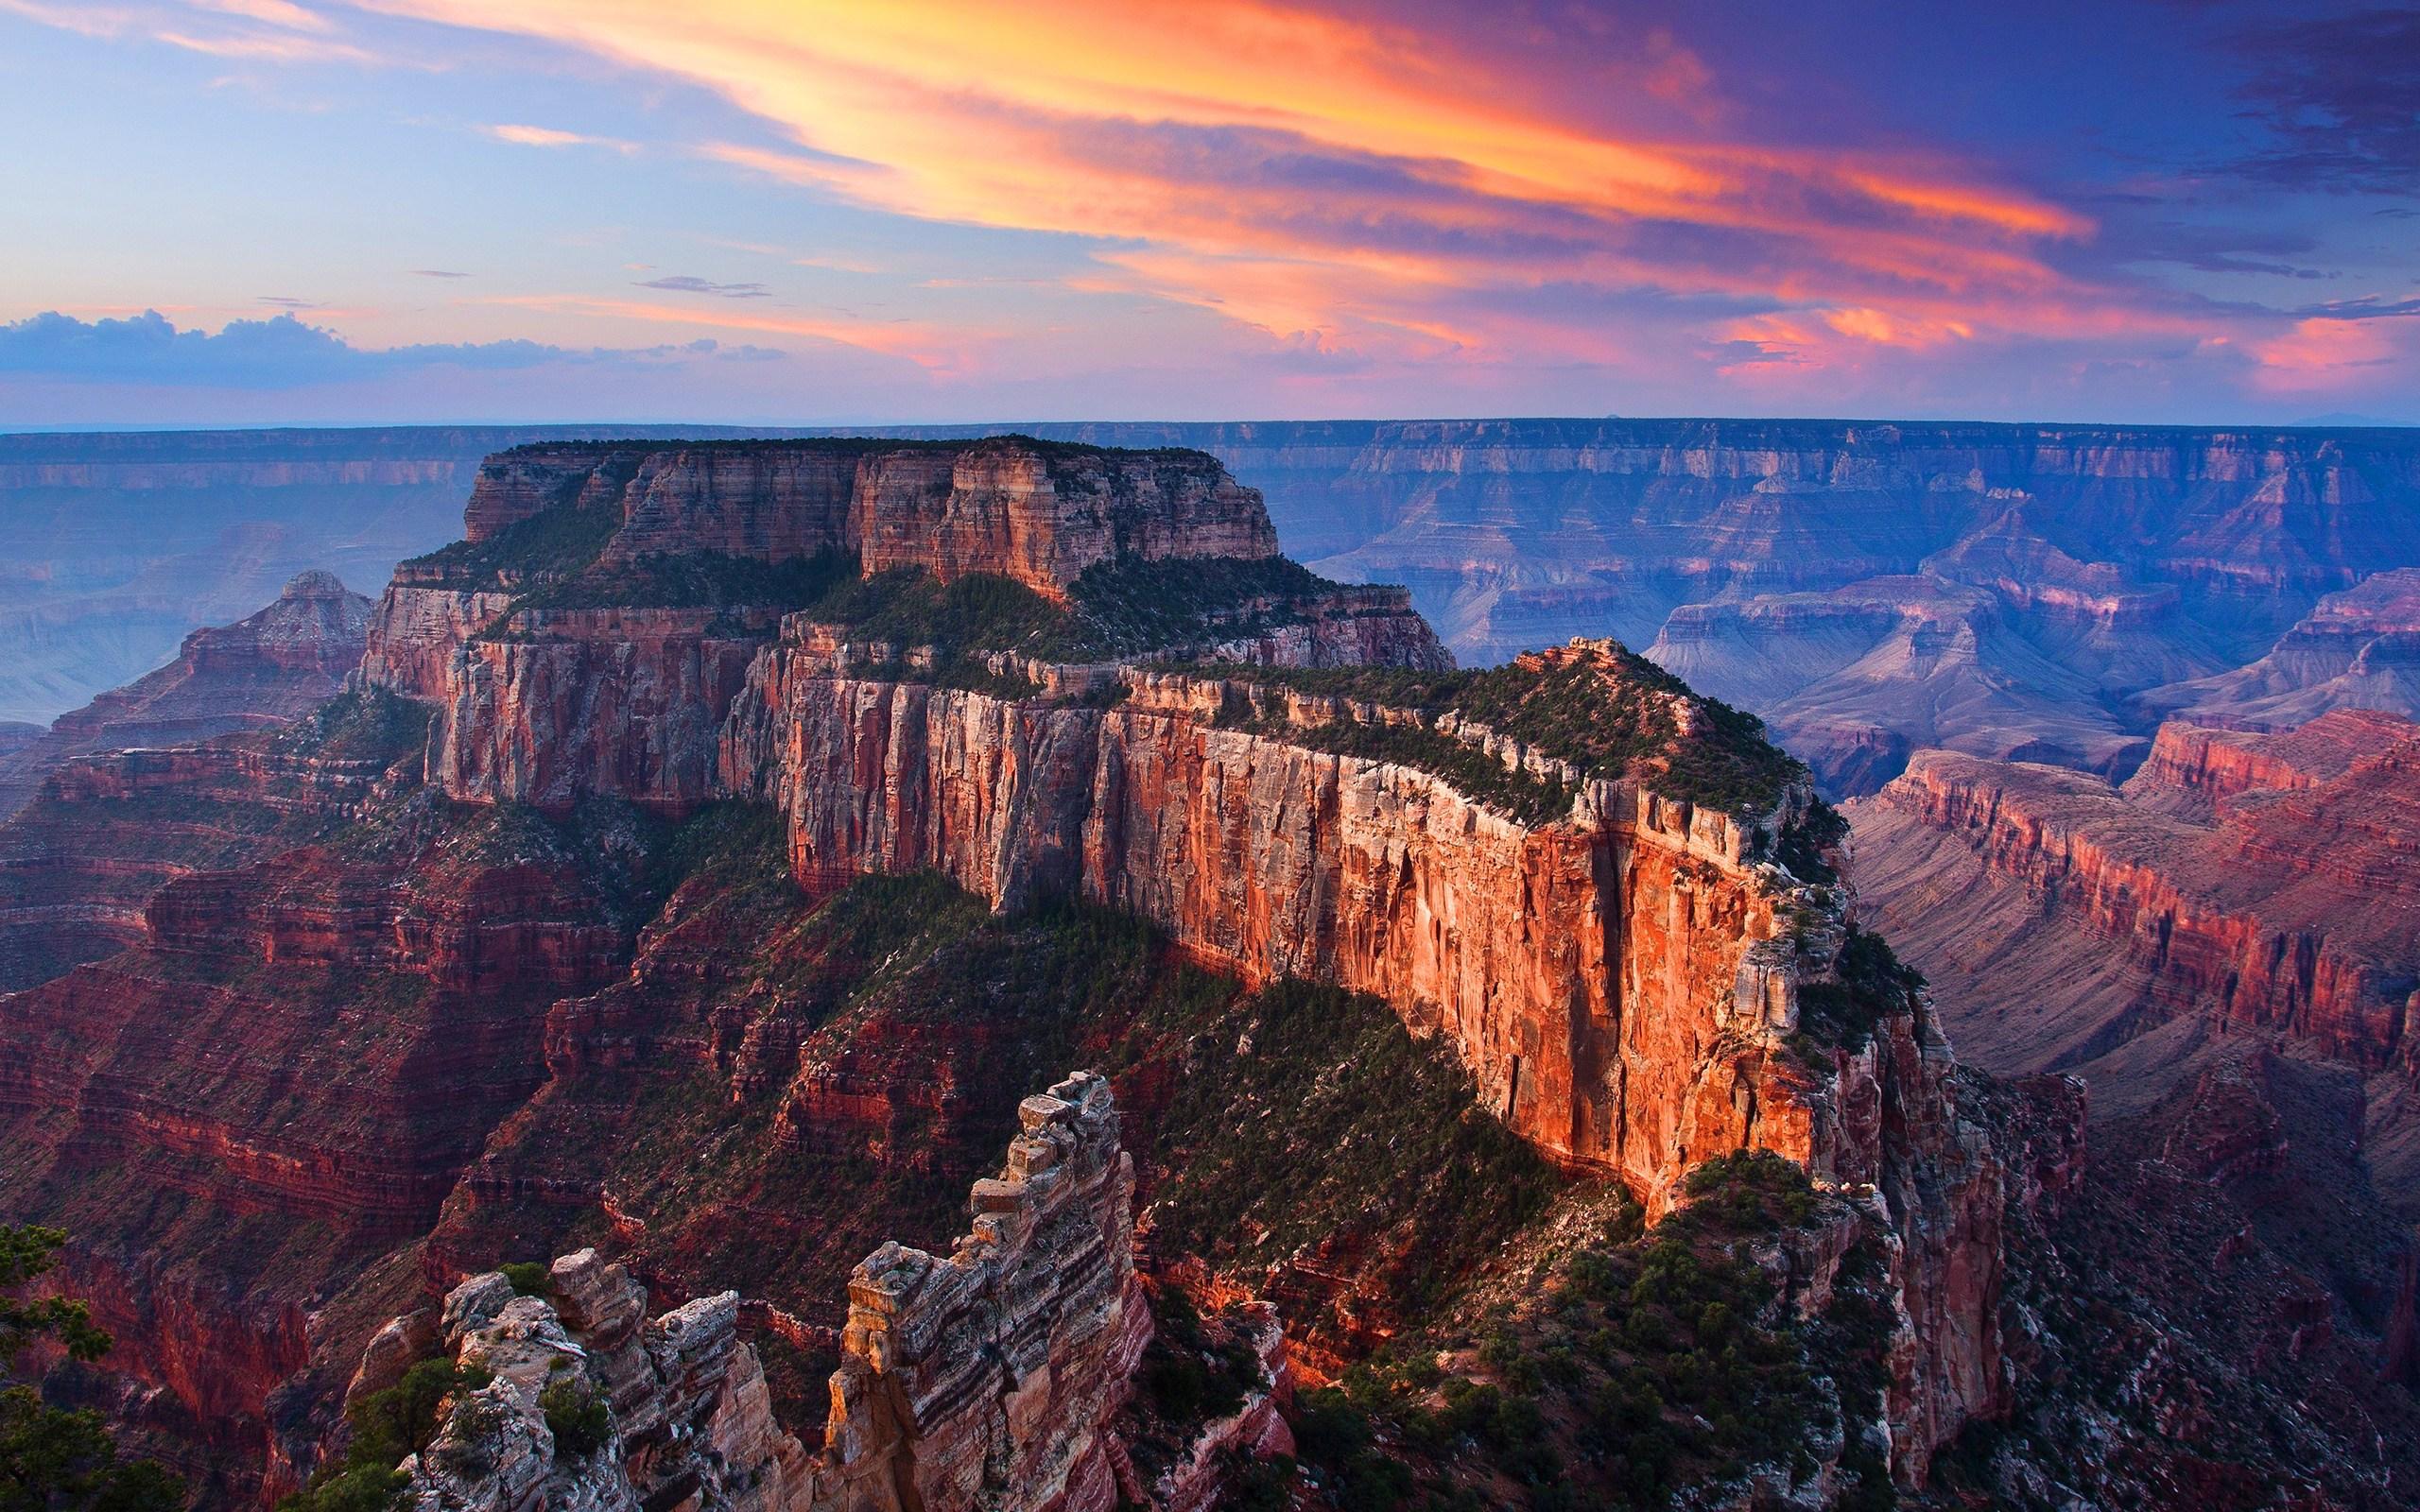 Grand Canyon Sunset Wallpapers Phone For Desktop Wallpaper